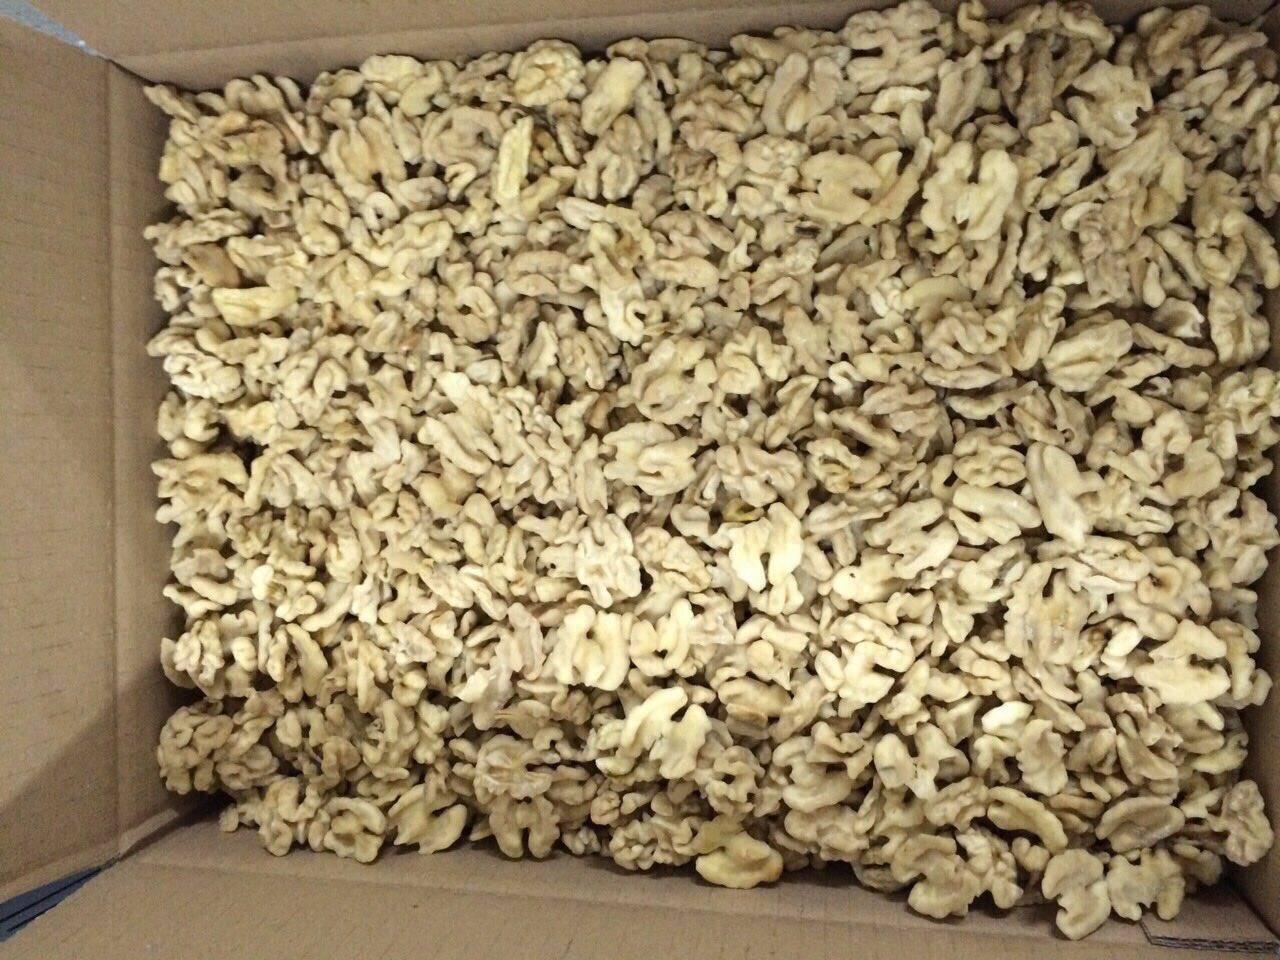 Walnut kernel from Ukraine